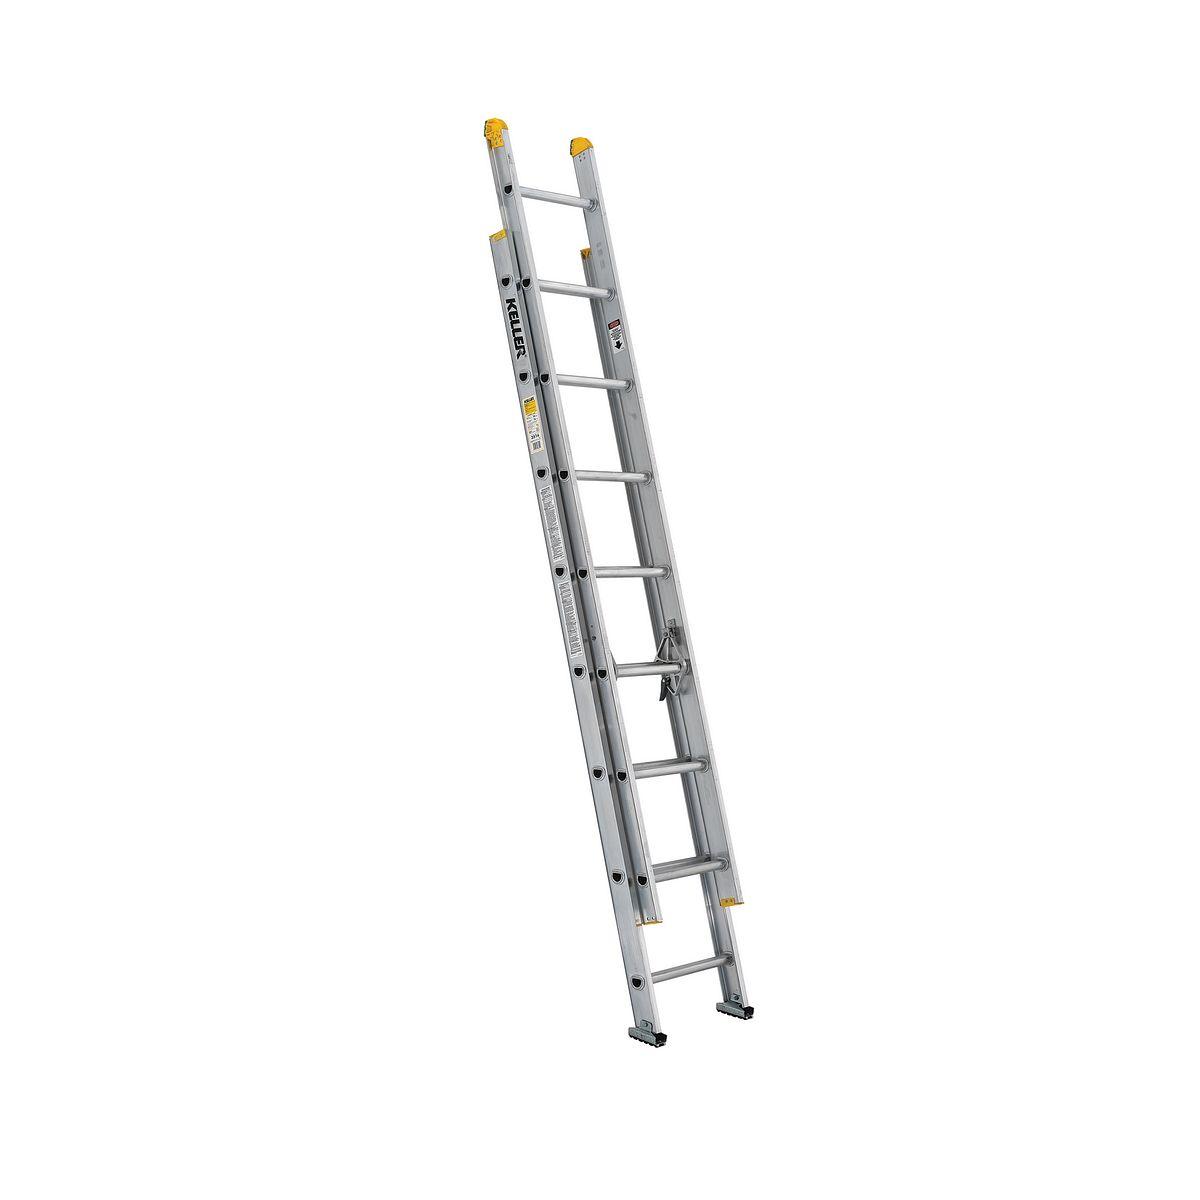 3516 At Extension Ladders Keller Us